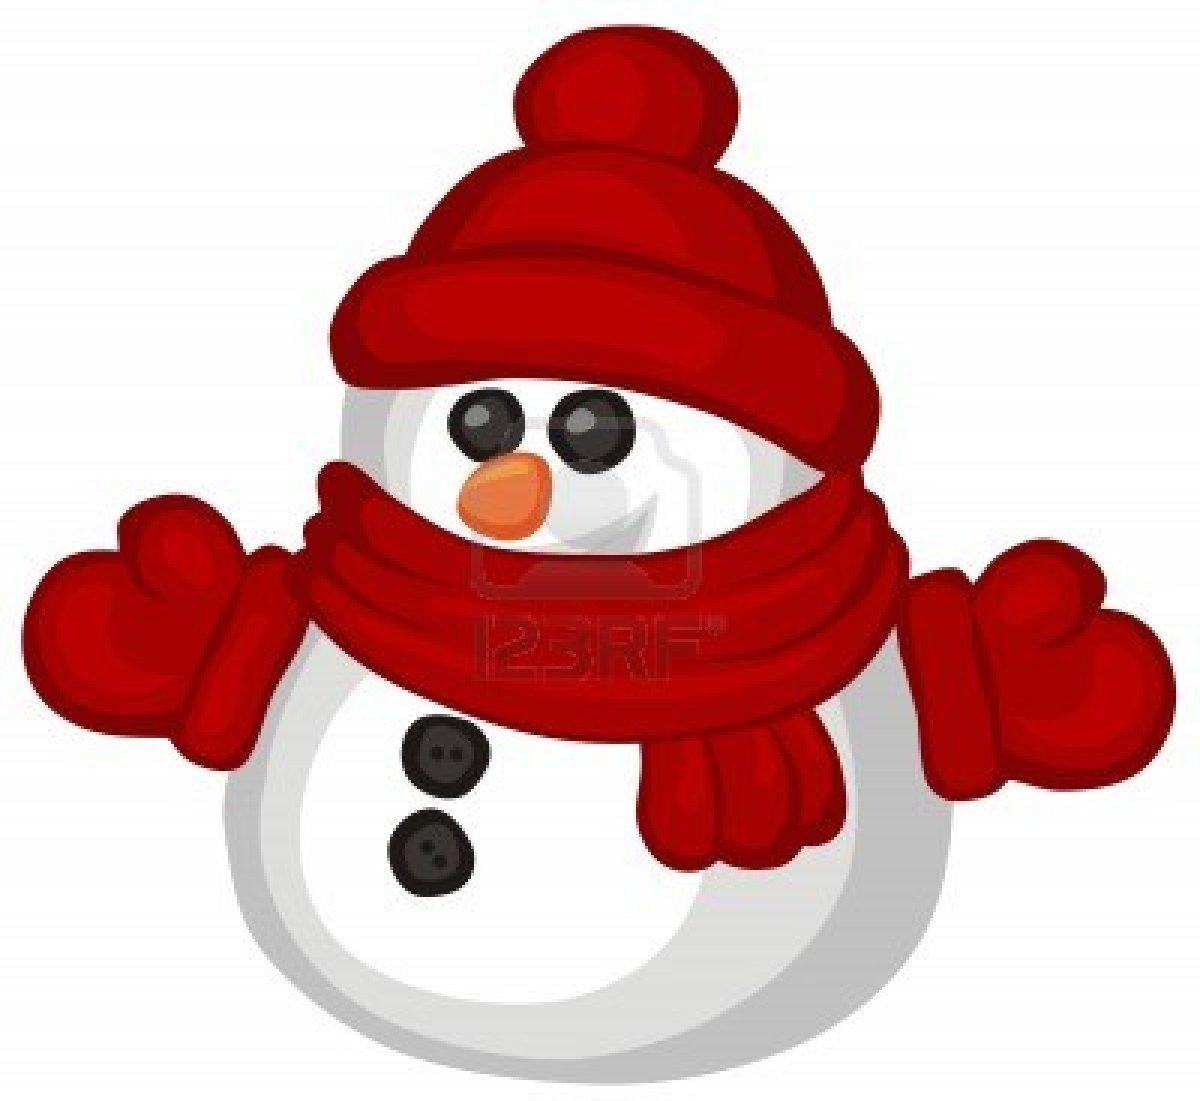 Snowman clipart christmas snowman Free clipart Snowflakes snowboarding Cartoon